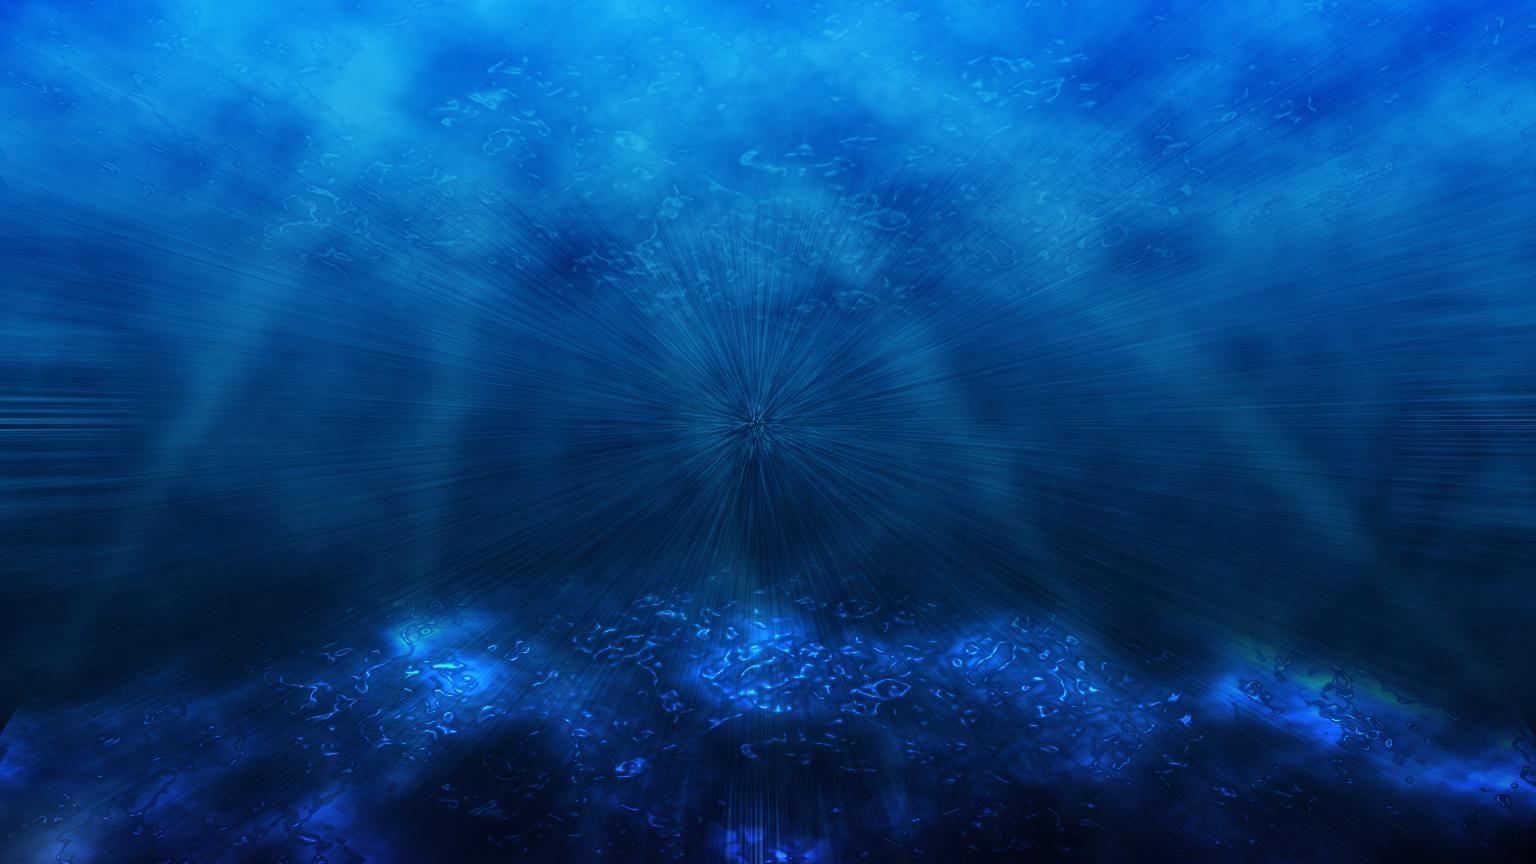 Blue Deep Sea Background 865588 Hd Wallpaper Backgrounds